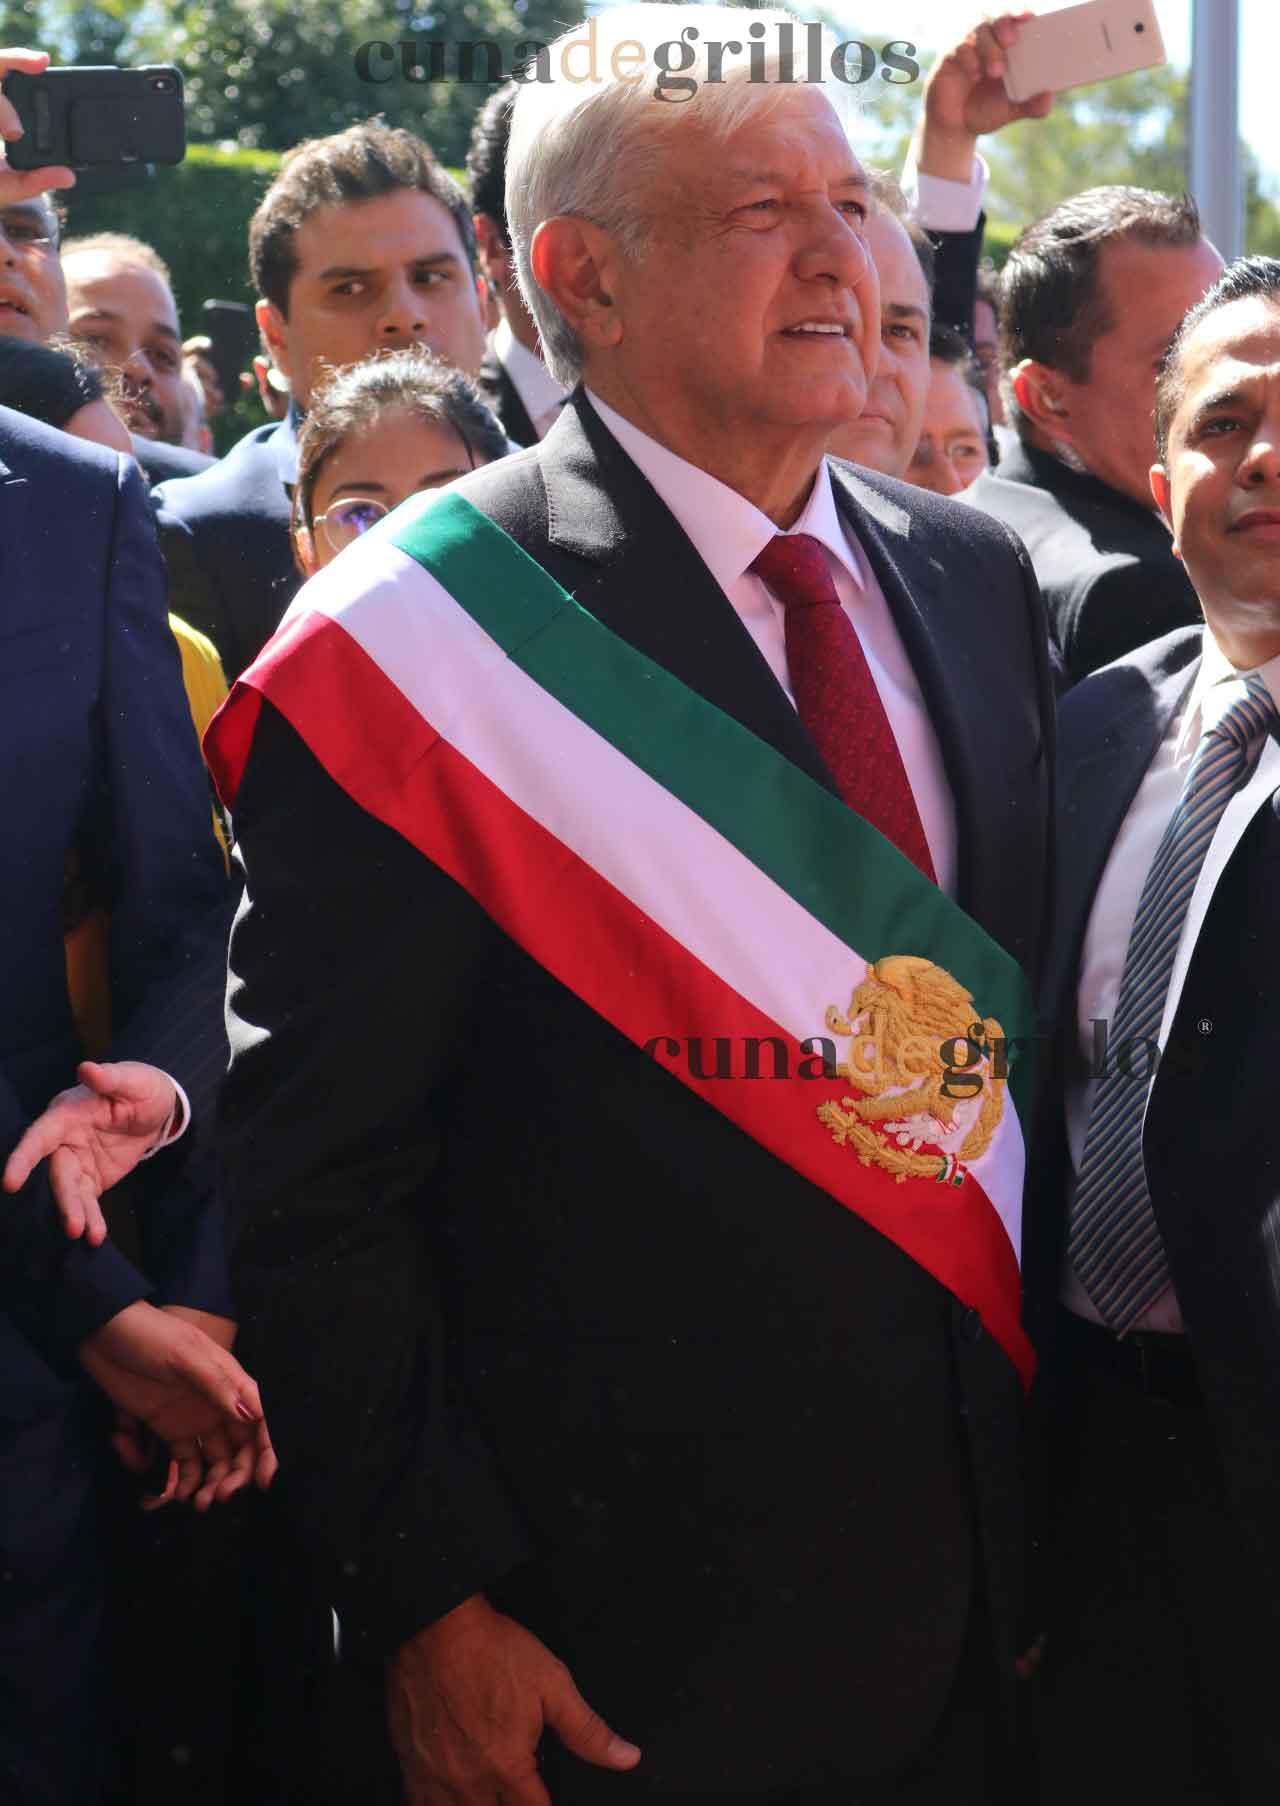 protesta de Andres Manuel 49